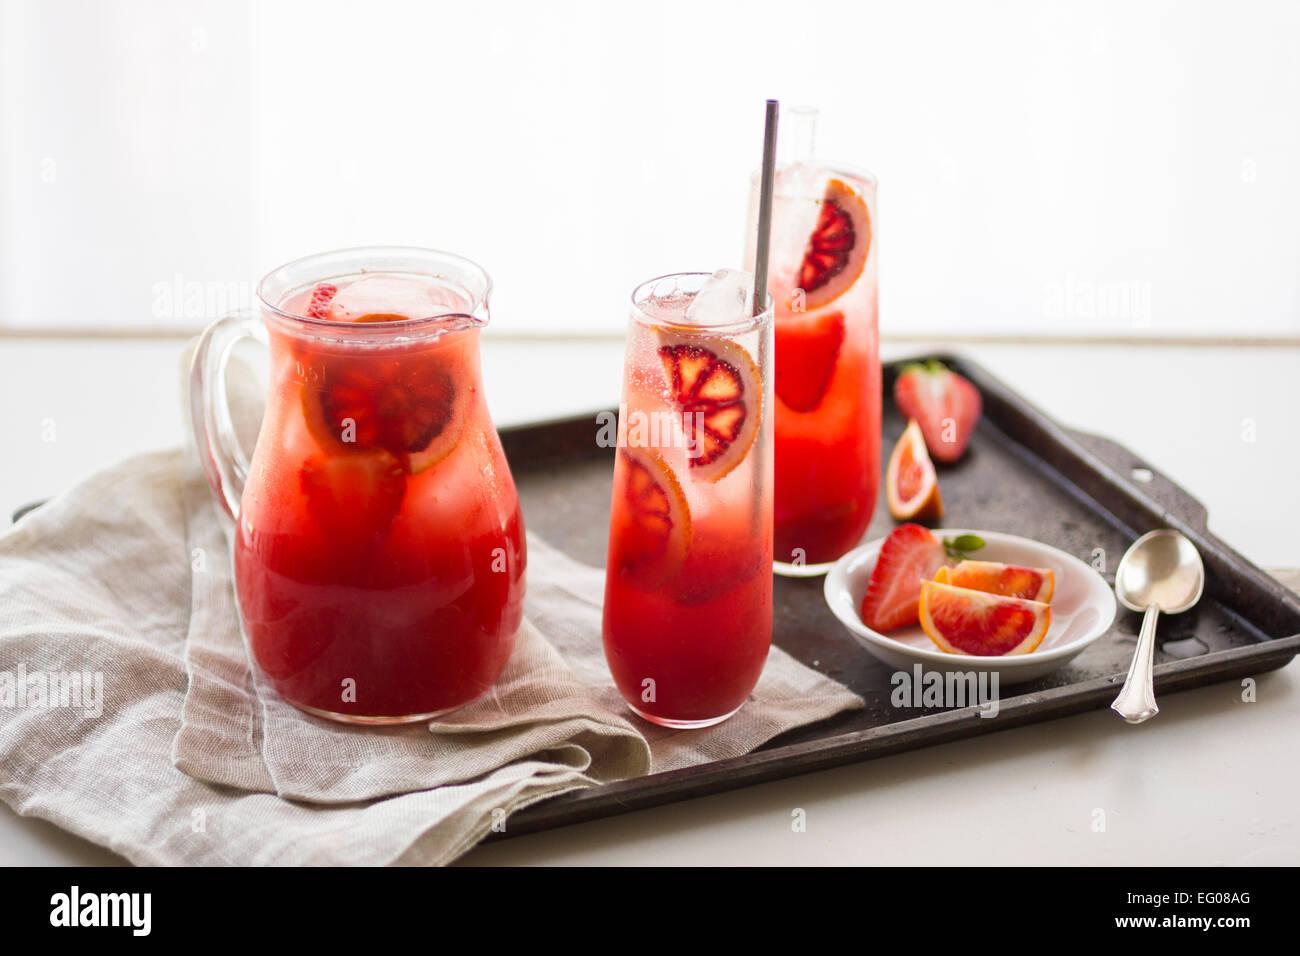 Strawberry Punch bebida naranja sanguina Imagen De Stock